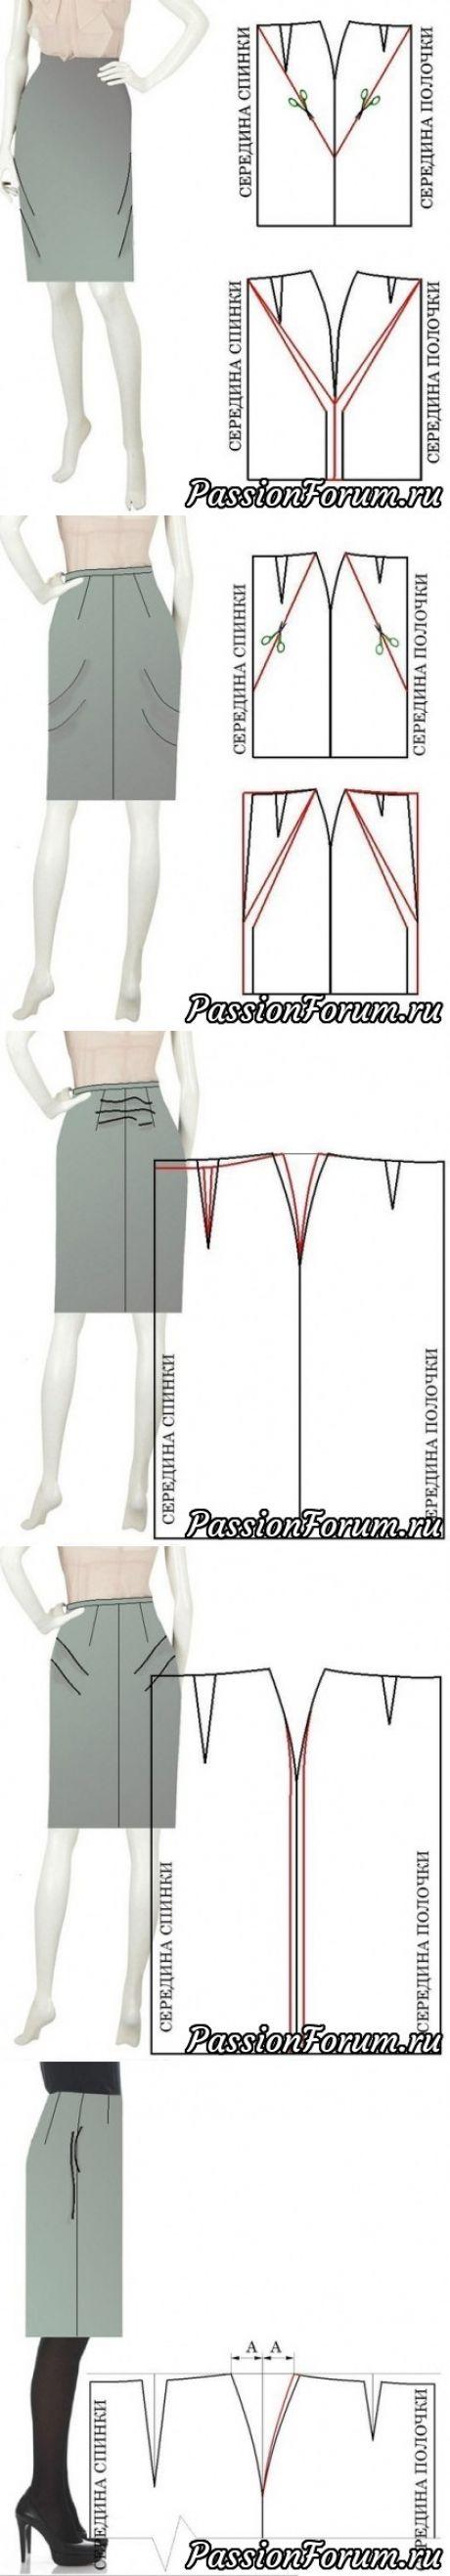 Skirt pattern alterations